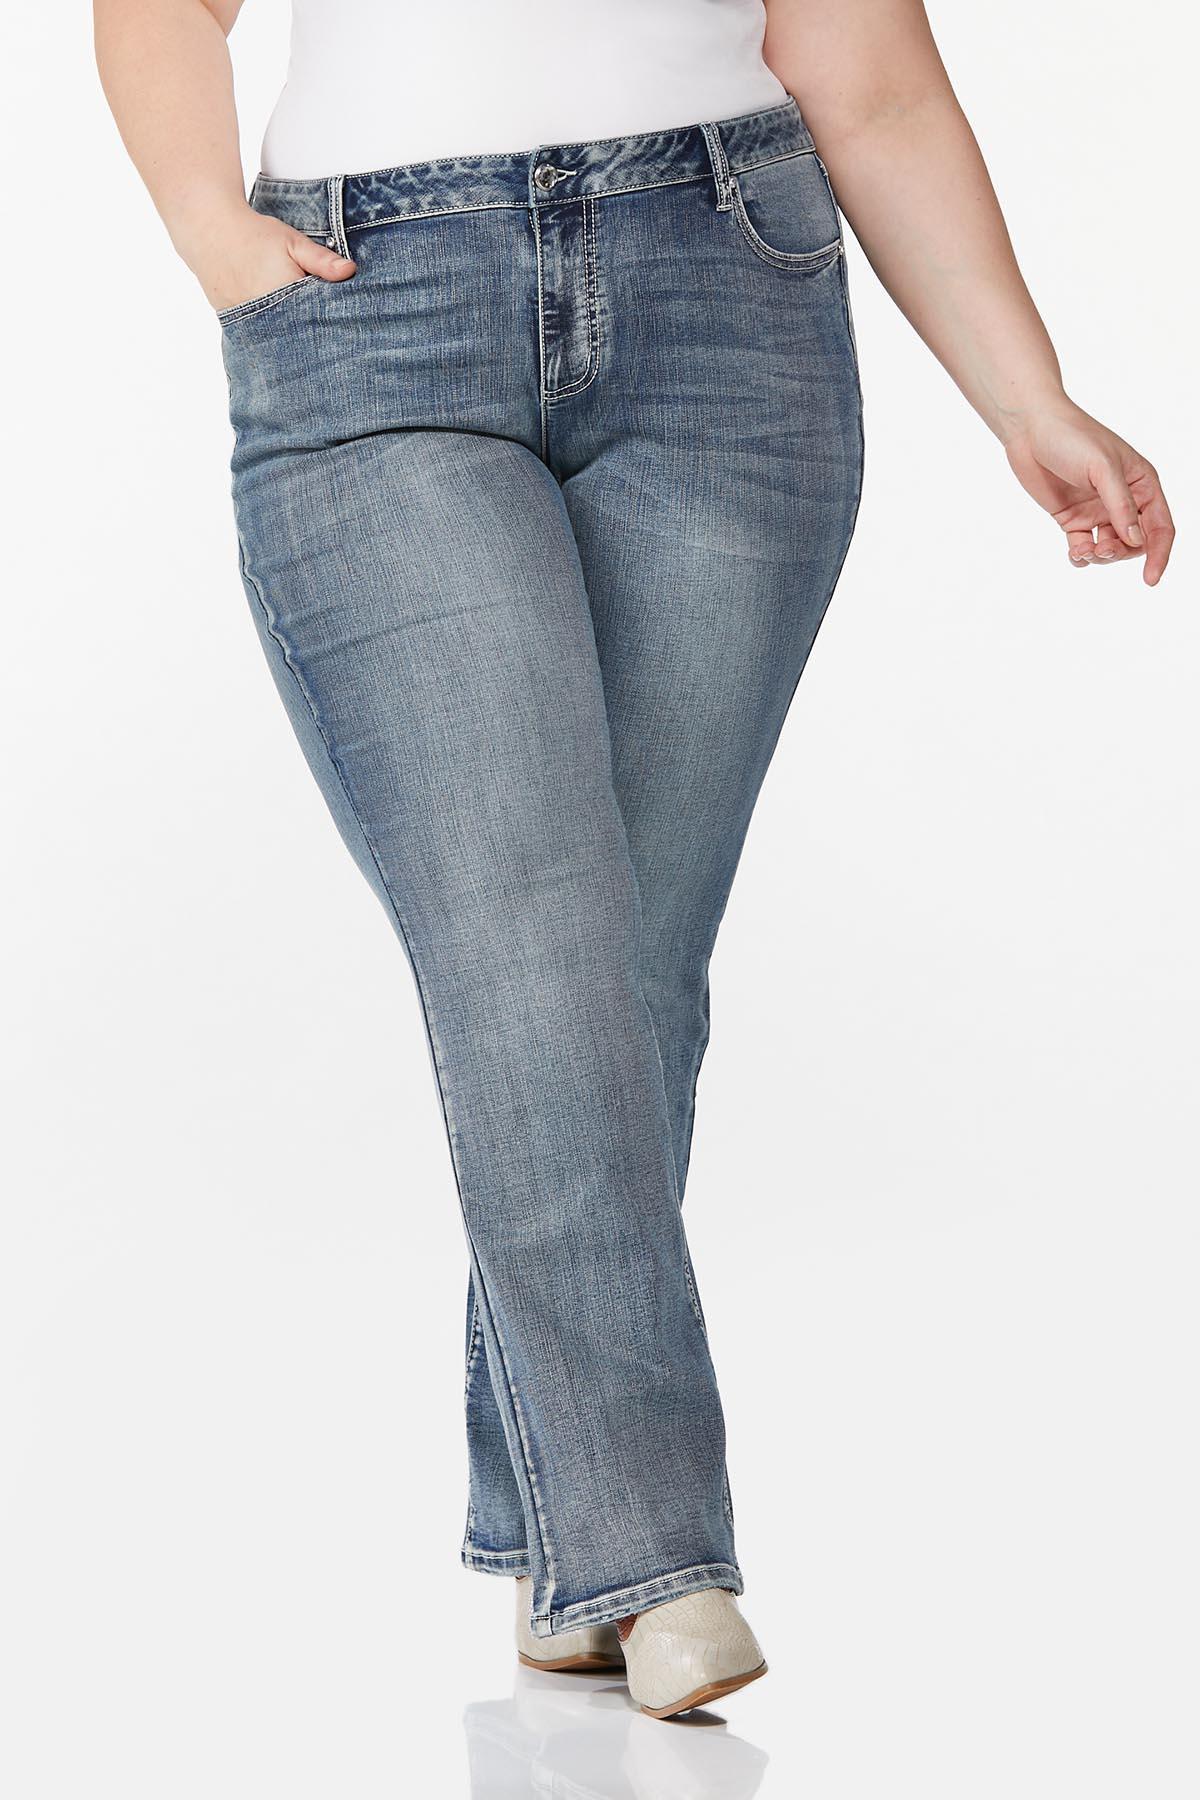 Plus Petite Embellished Curvy Jeans (Item #44726544)